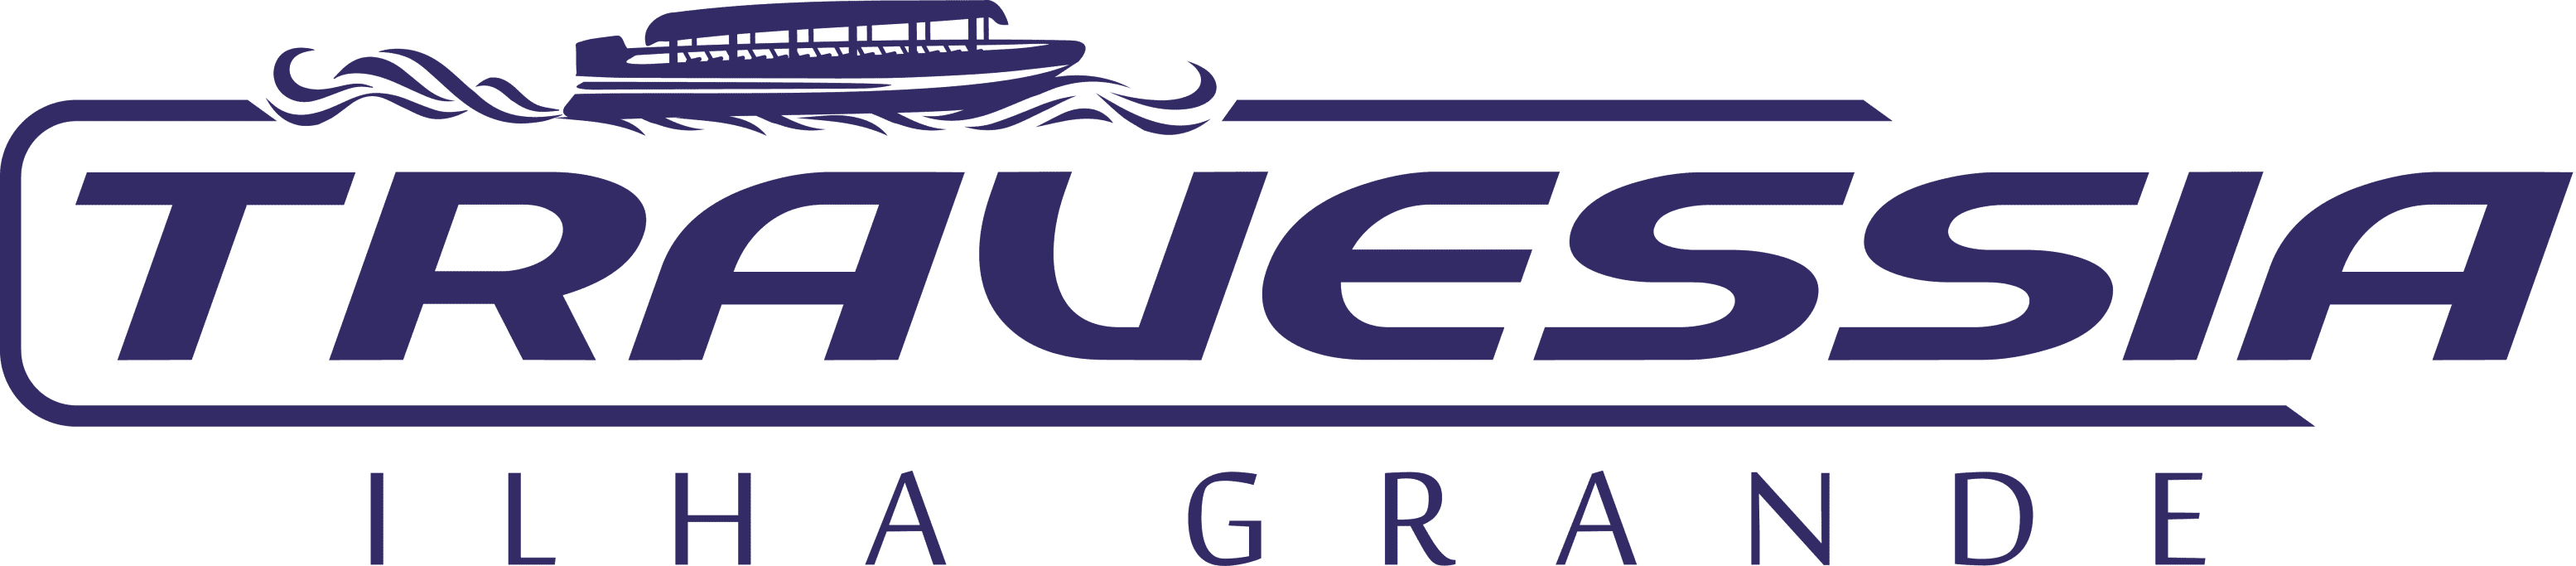 Ilha Grande Travessia Logo